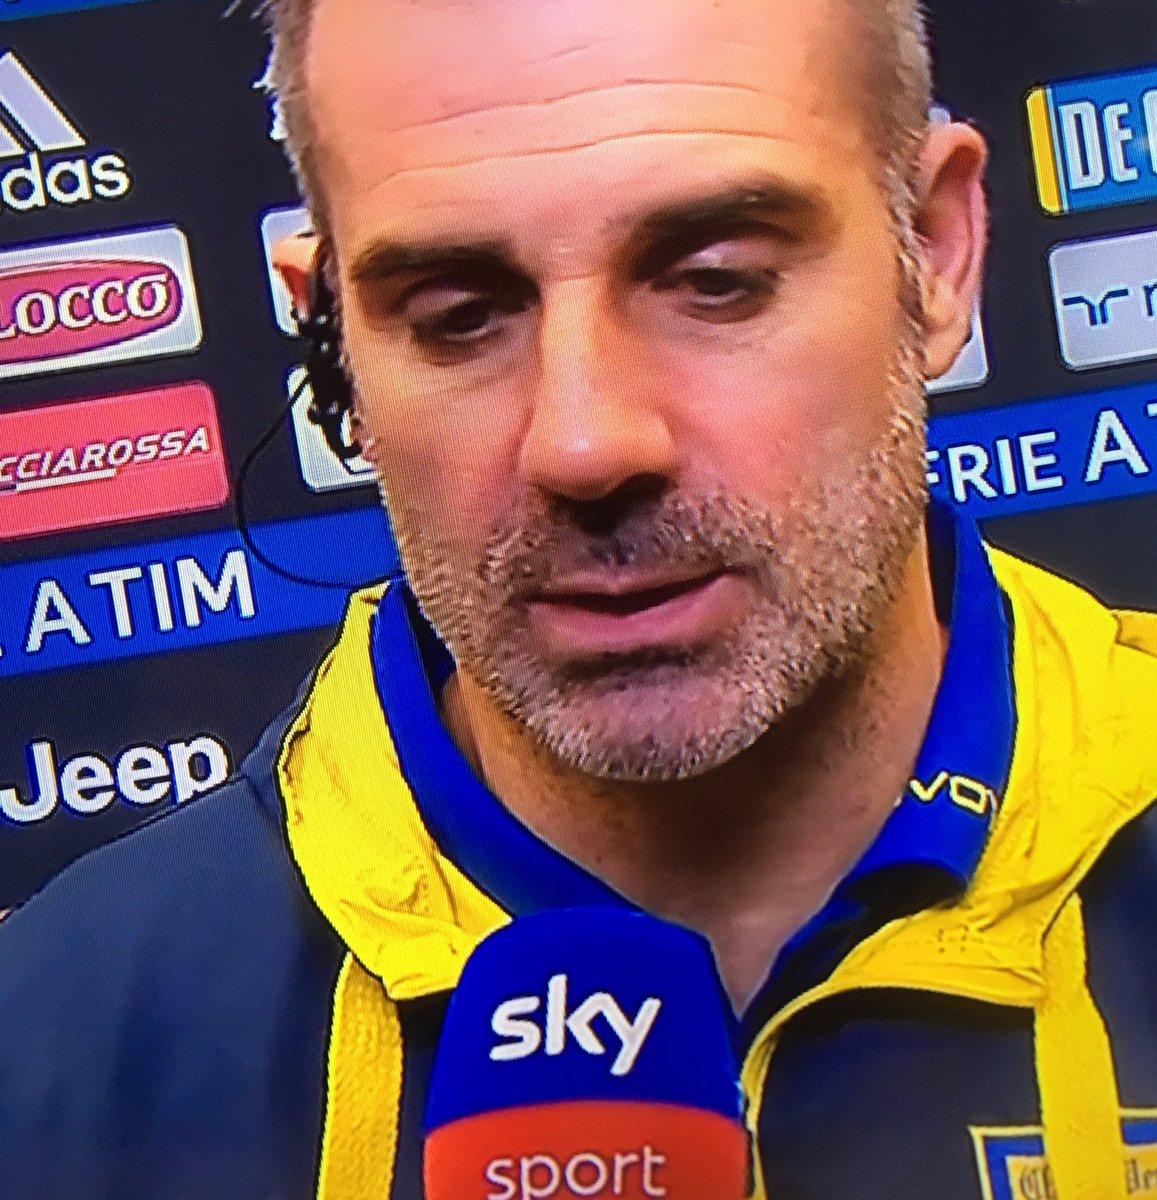 #JuventusChievo